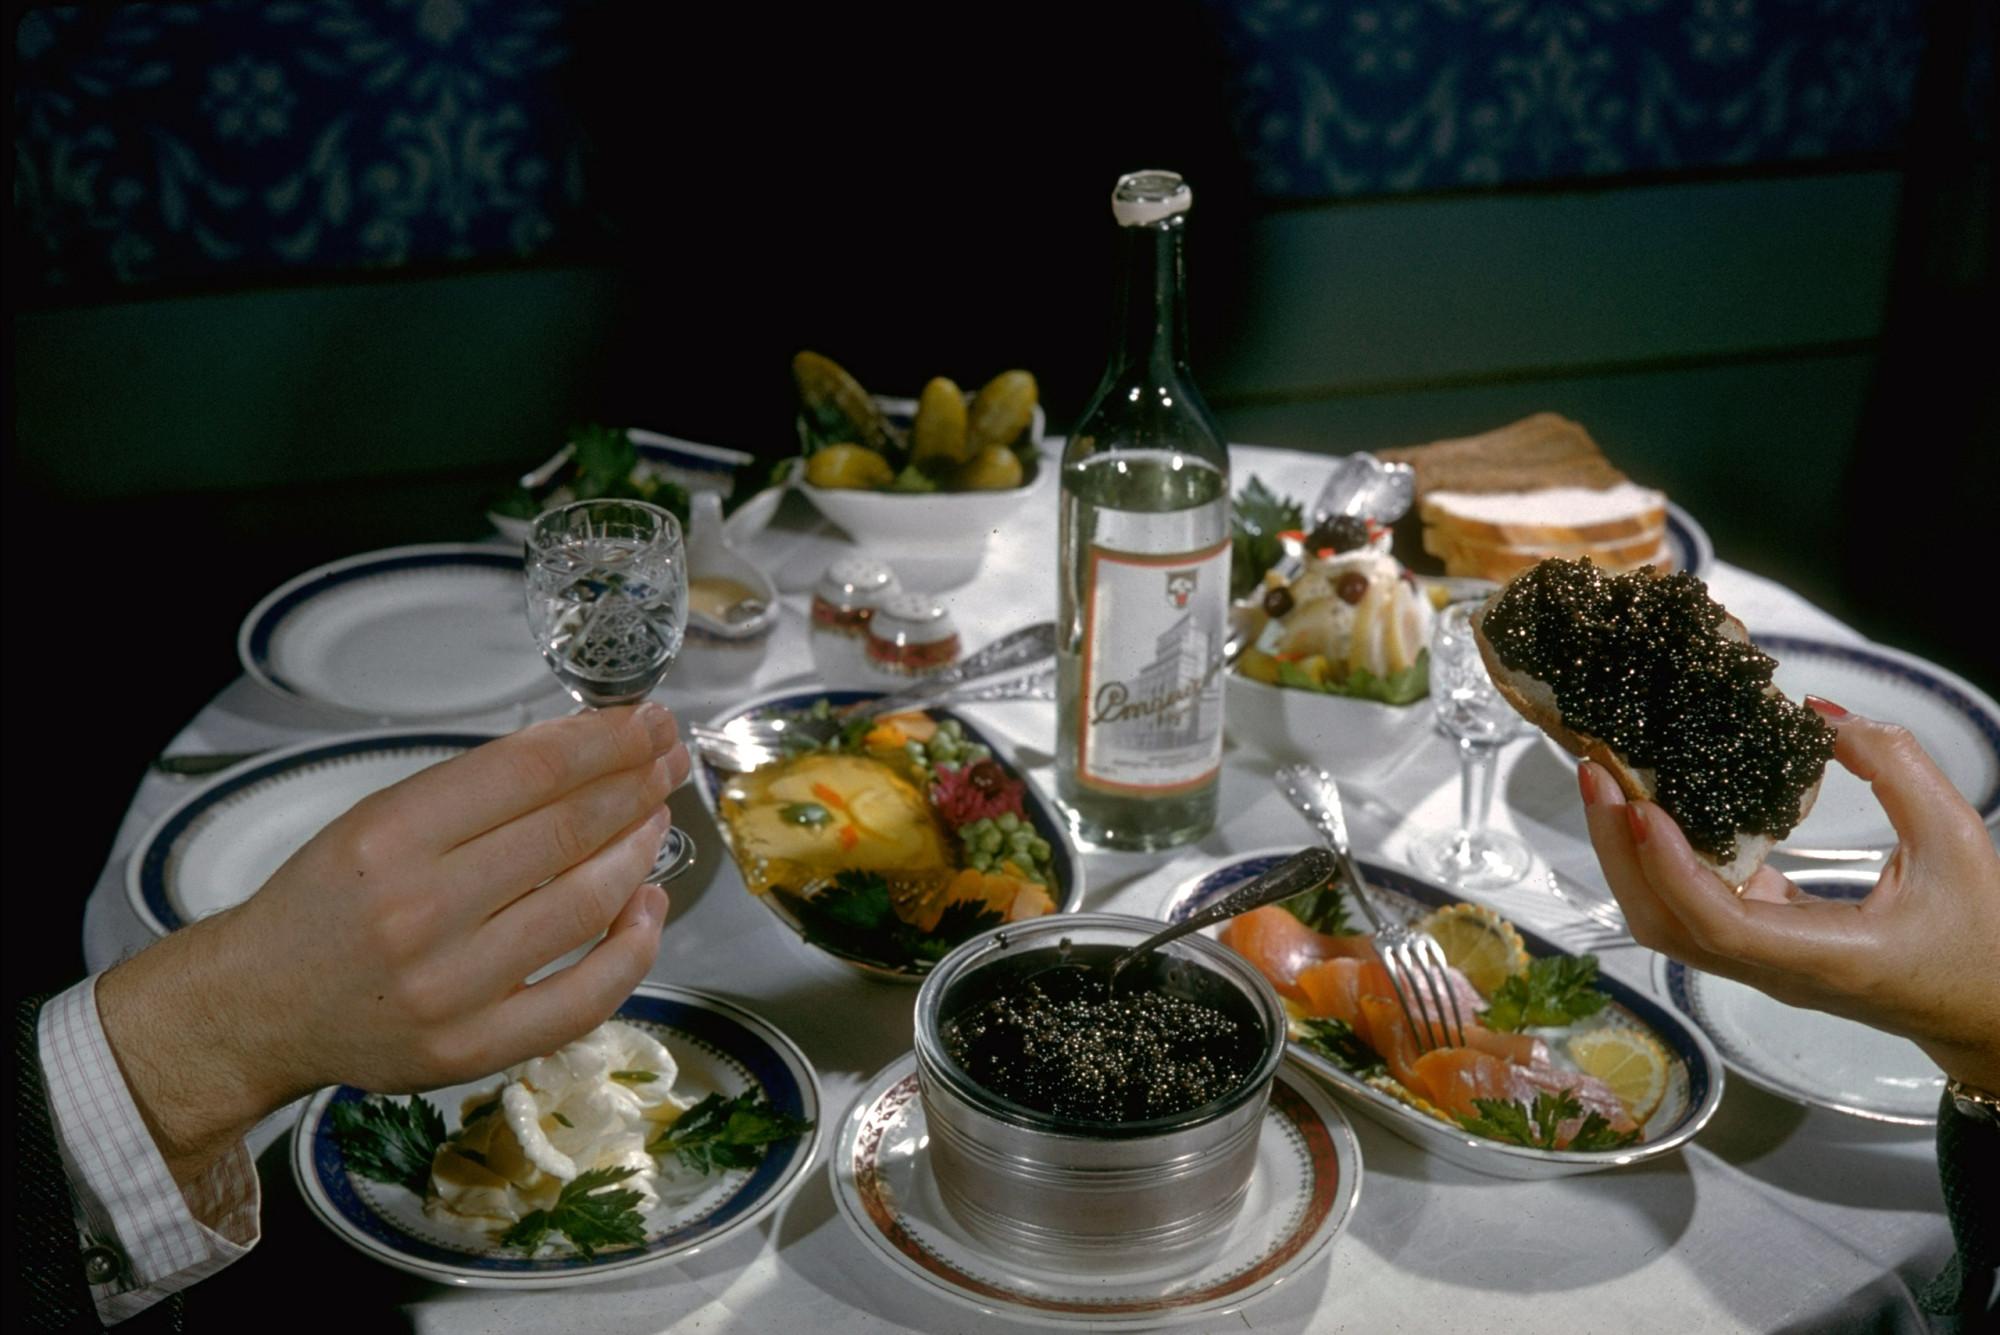 1960 Чёрная икра на столе. Москва. Carl Mydans. The LIFE Pictur